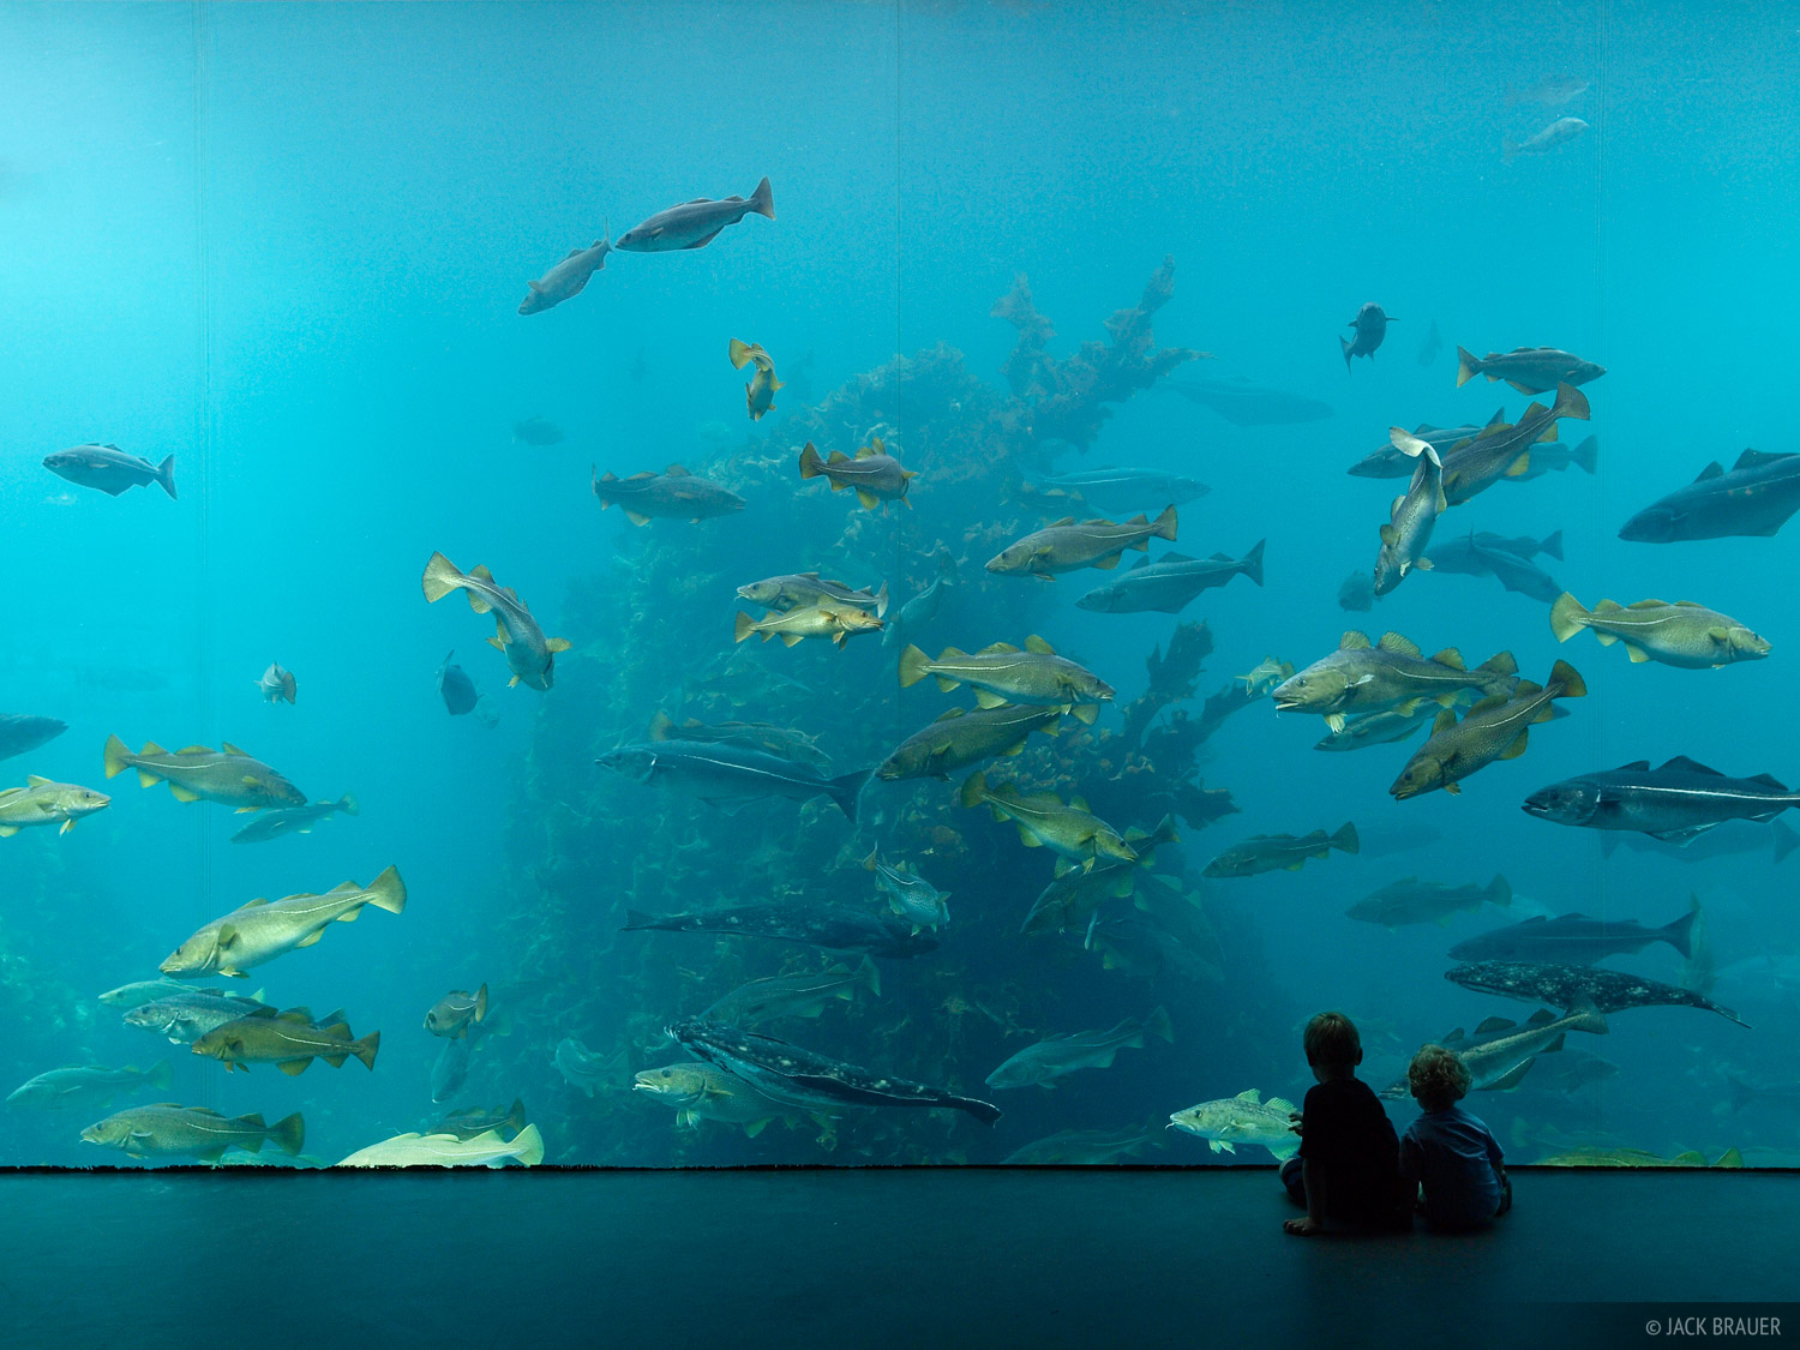 Atlanterhavsparken Aquarium, Ålesund, Norway, photo